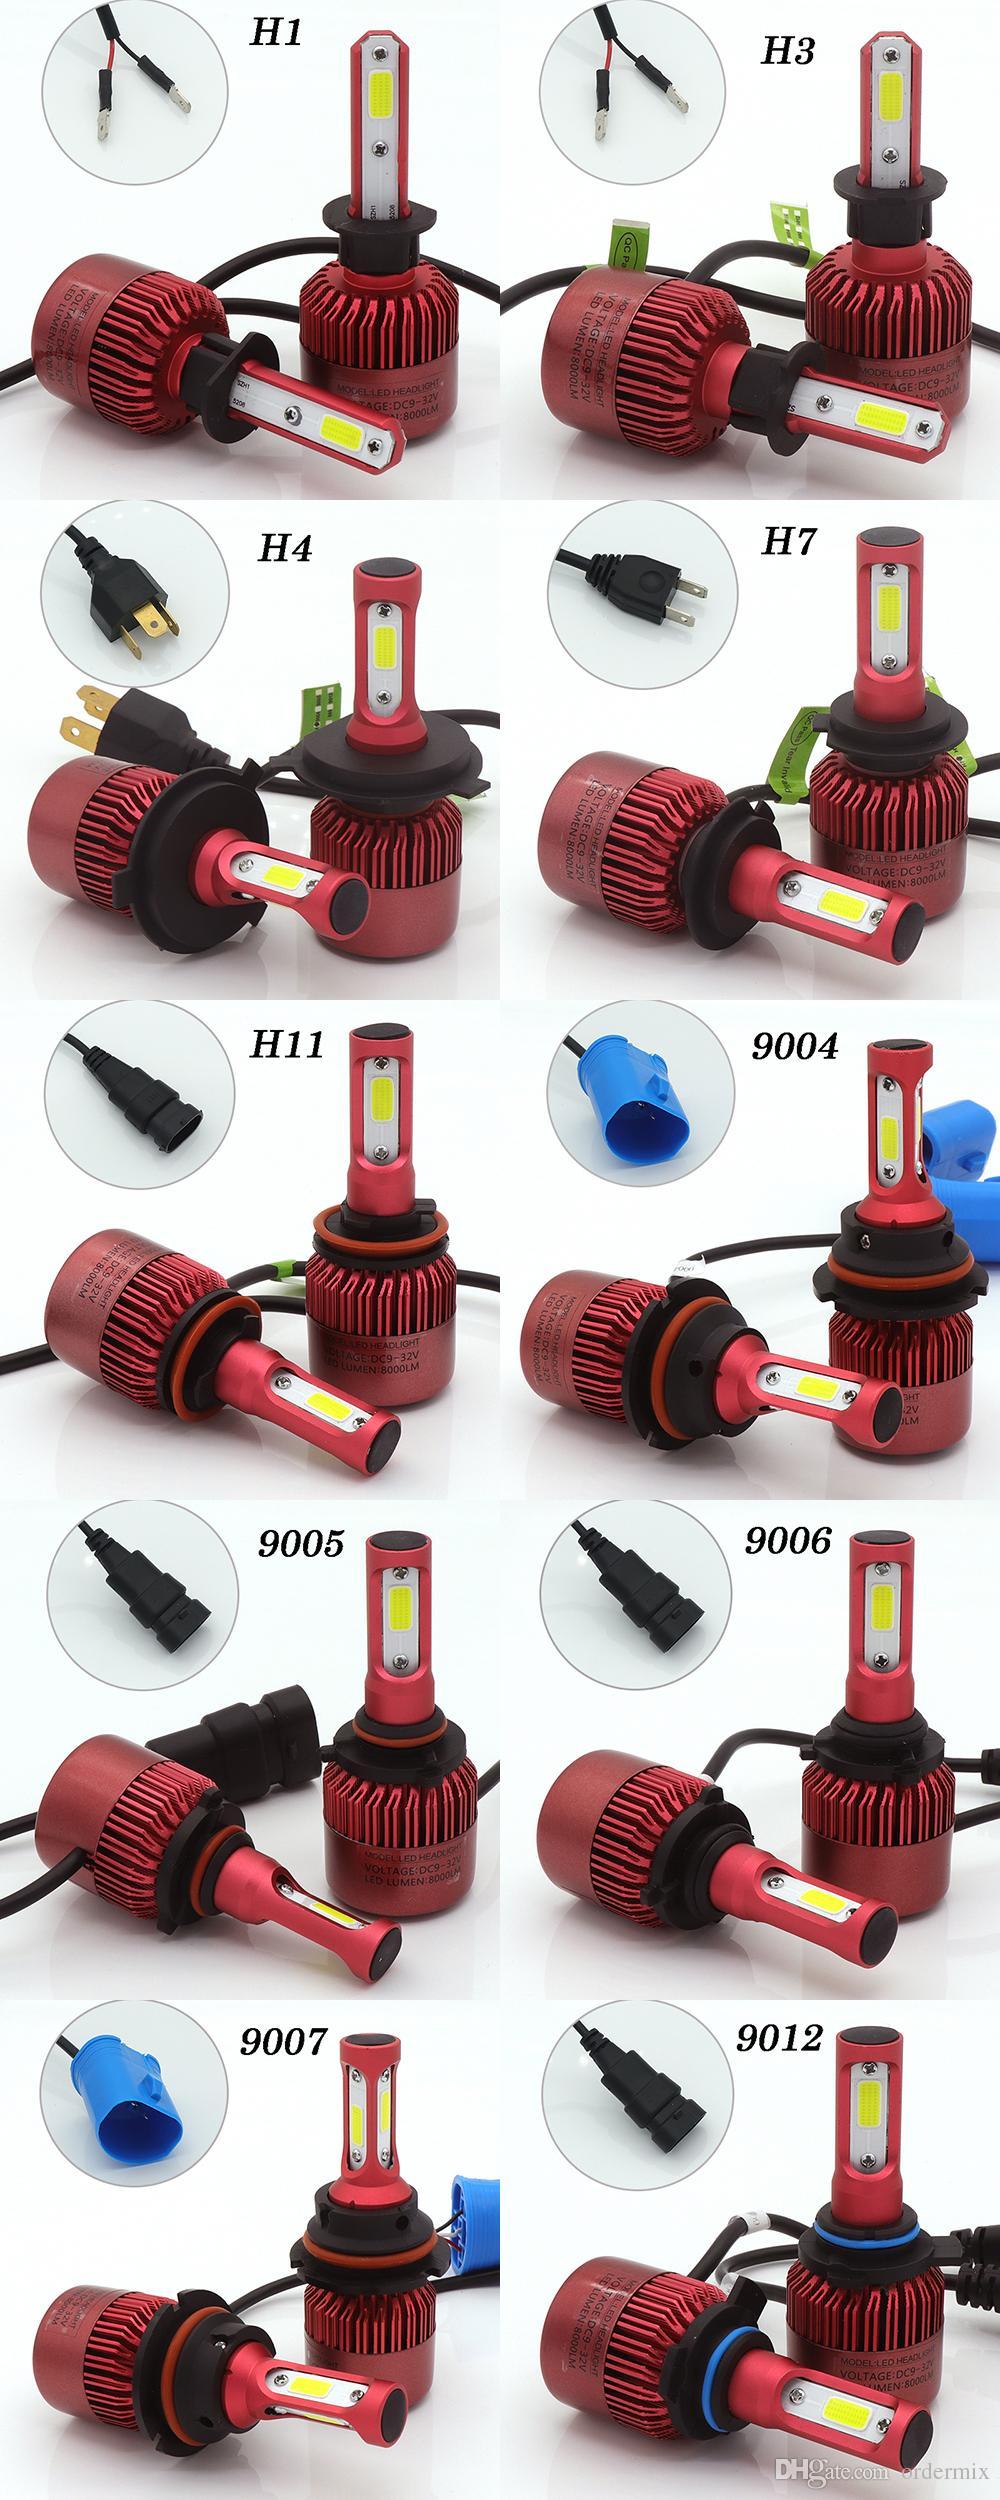 Bombilla de faros delanteros LED para automóvil H4 Canbus H7 72W 8000LM H1 H3 HB3 9005 HB4 9006 9012 12V Kit de conversión de cabezal del automóvil H4 Hi-Lo Beam